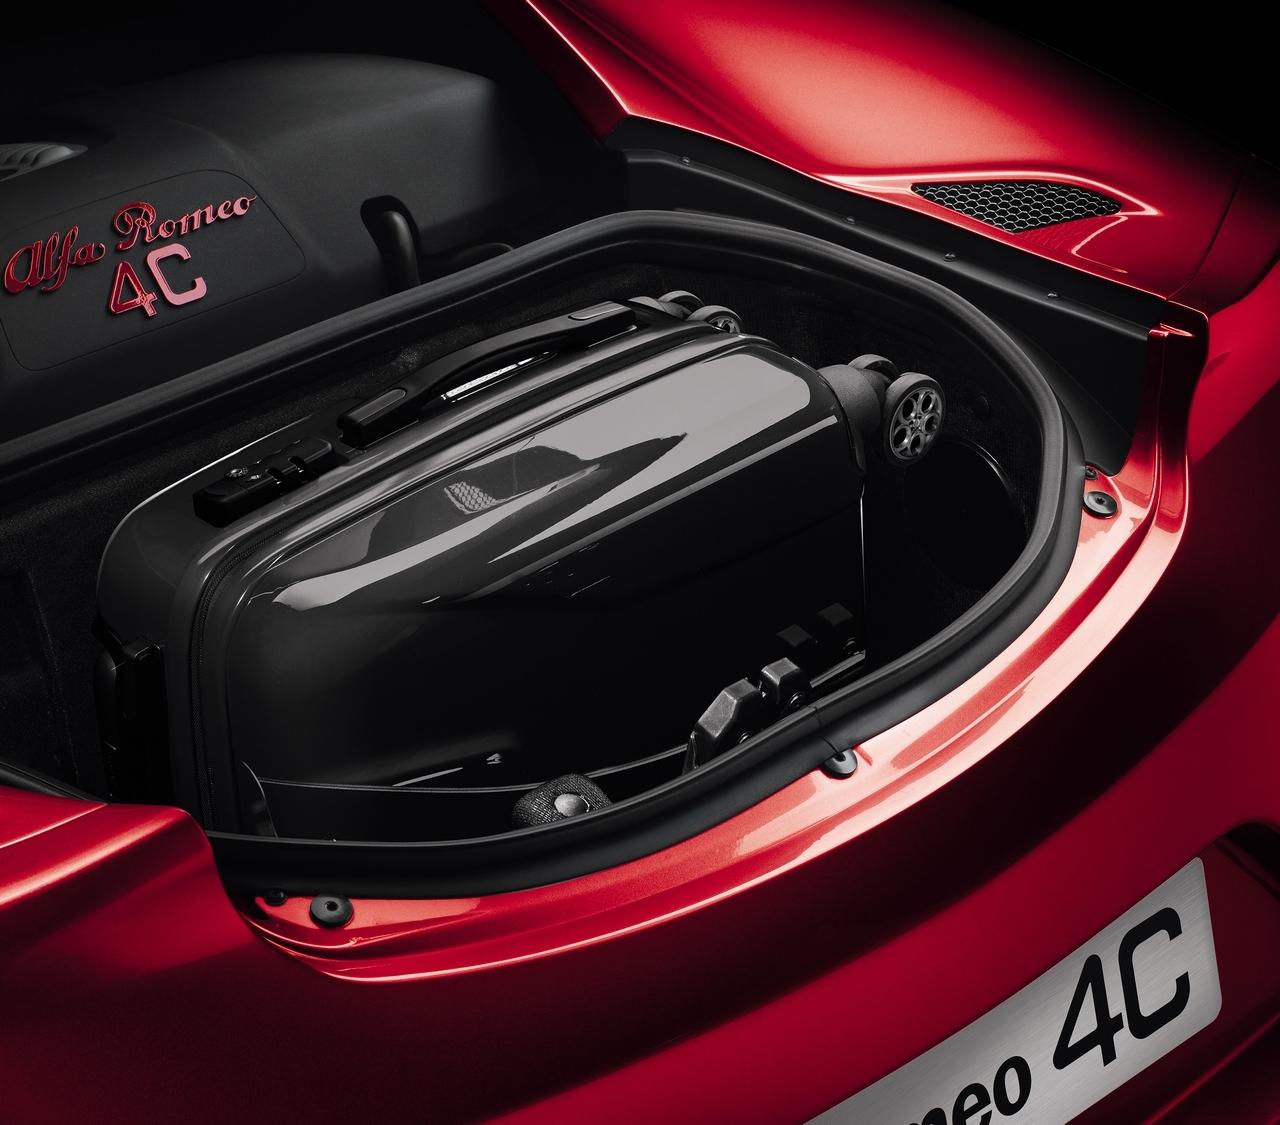 "UFFICIALE: L'Alfa Romeo 4C Conferma 8'04"" Al Nurburgring"